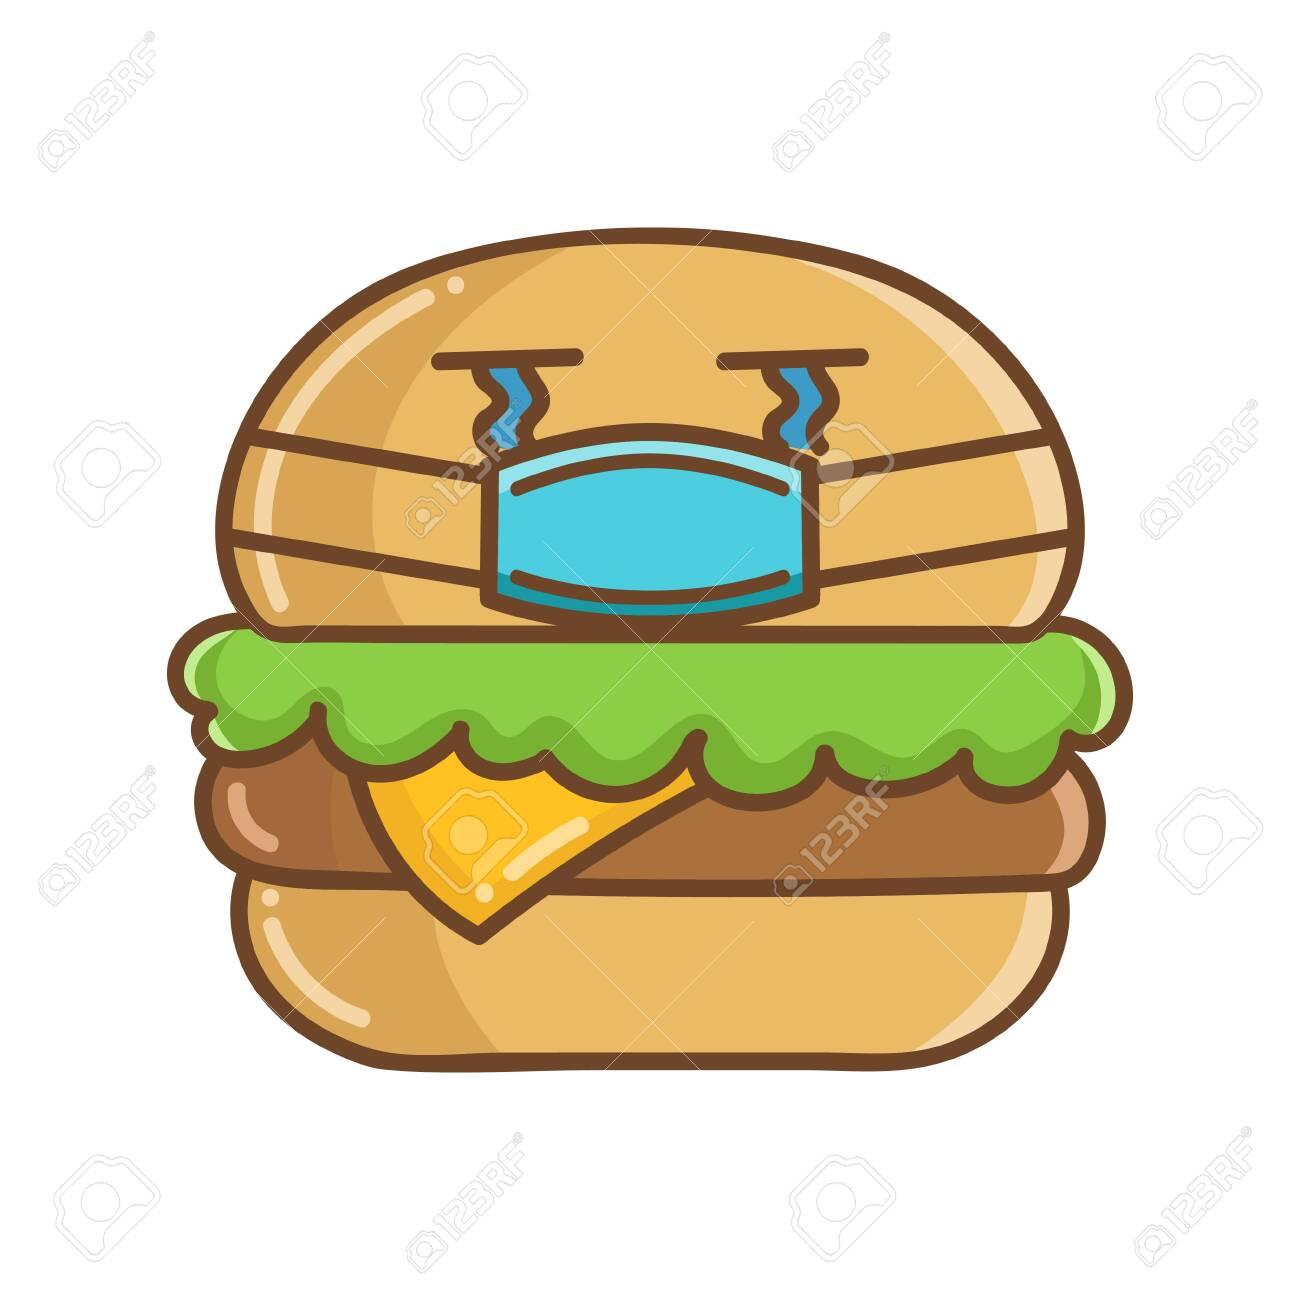 Kawaii Hamburger Wearing Protective Face Mask Cartoon Isolated On White Background Clip Art Libres De Droits Vecteurs Et Illustration Image 153399831